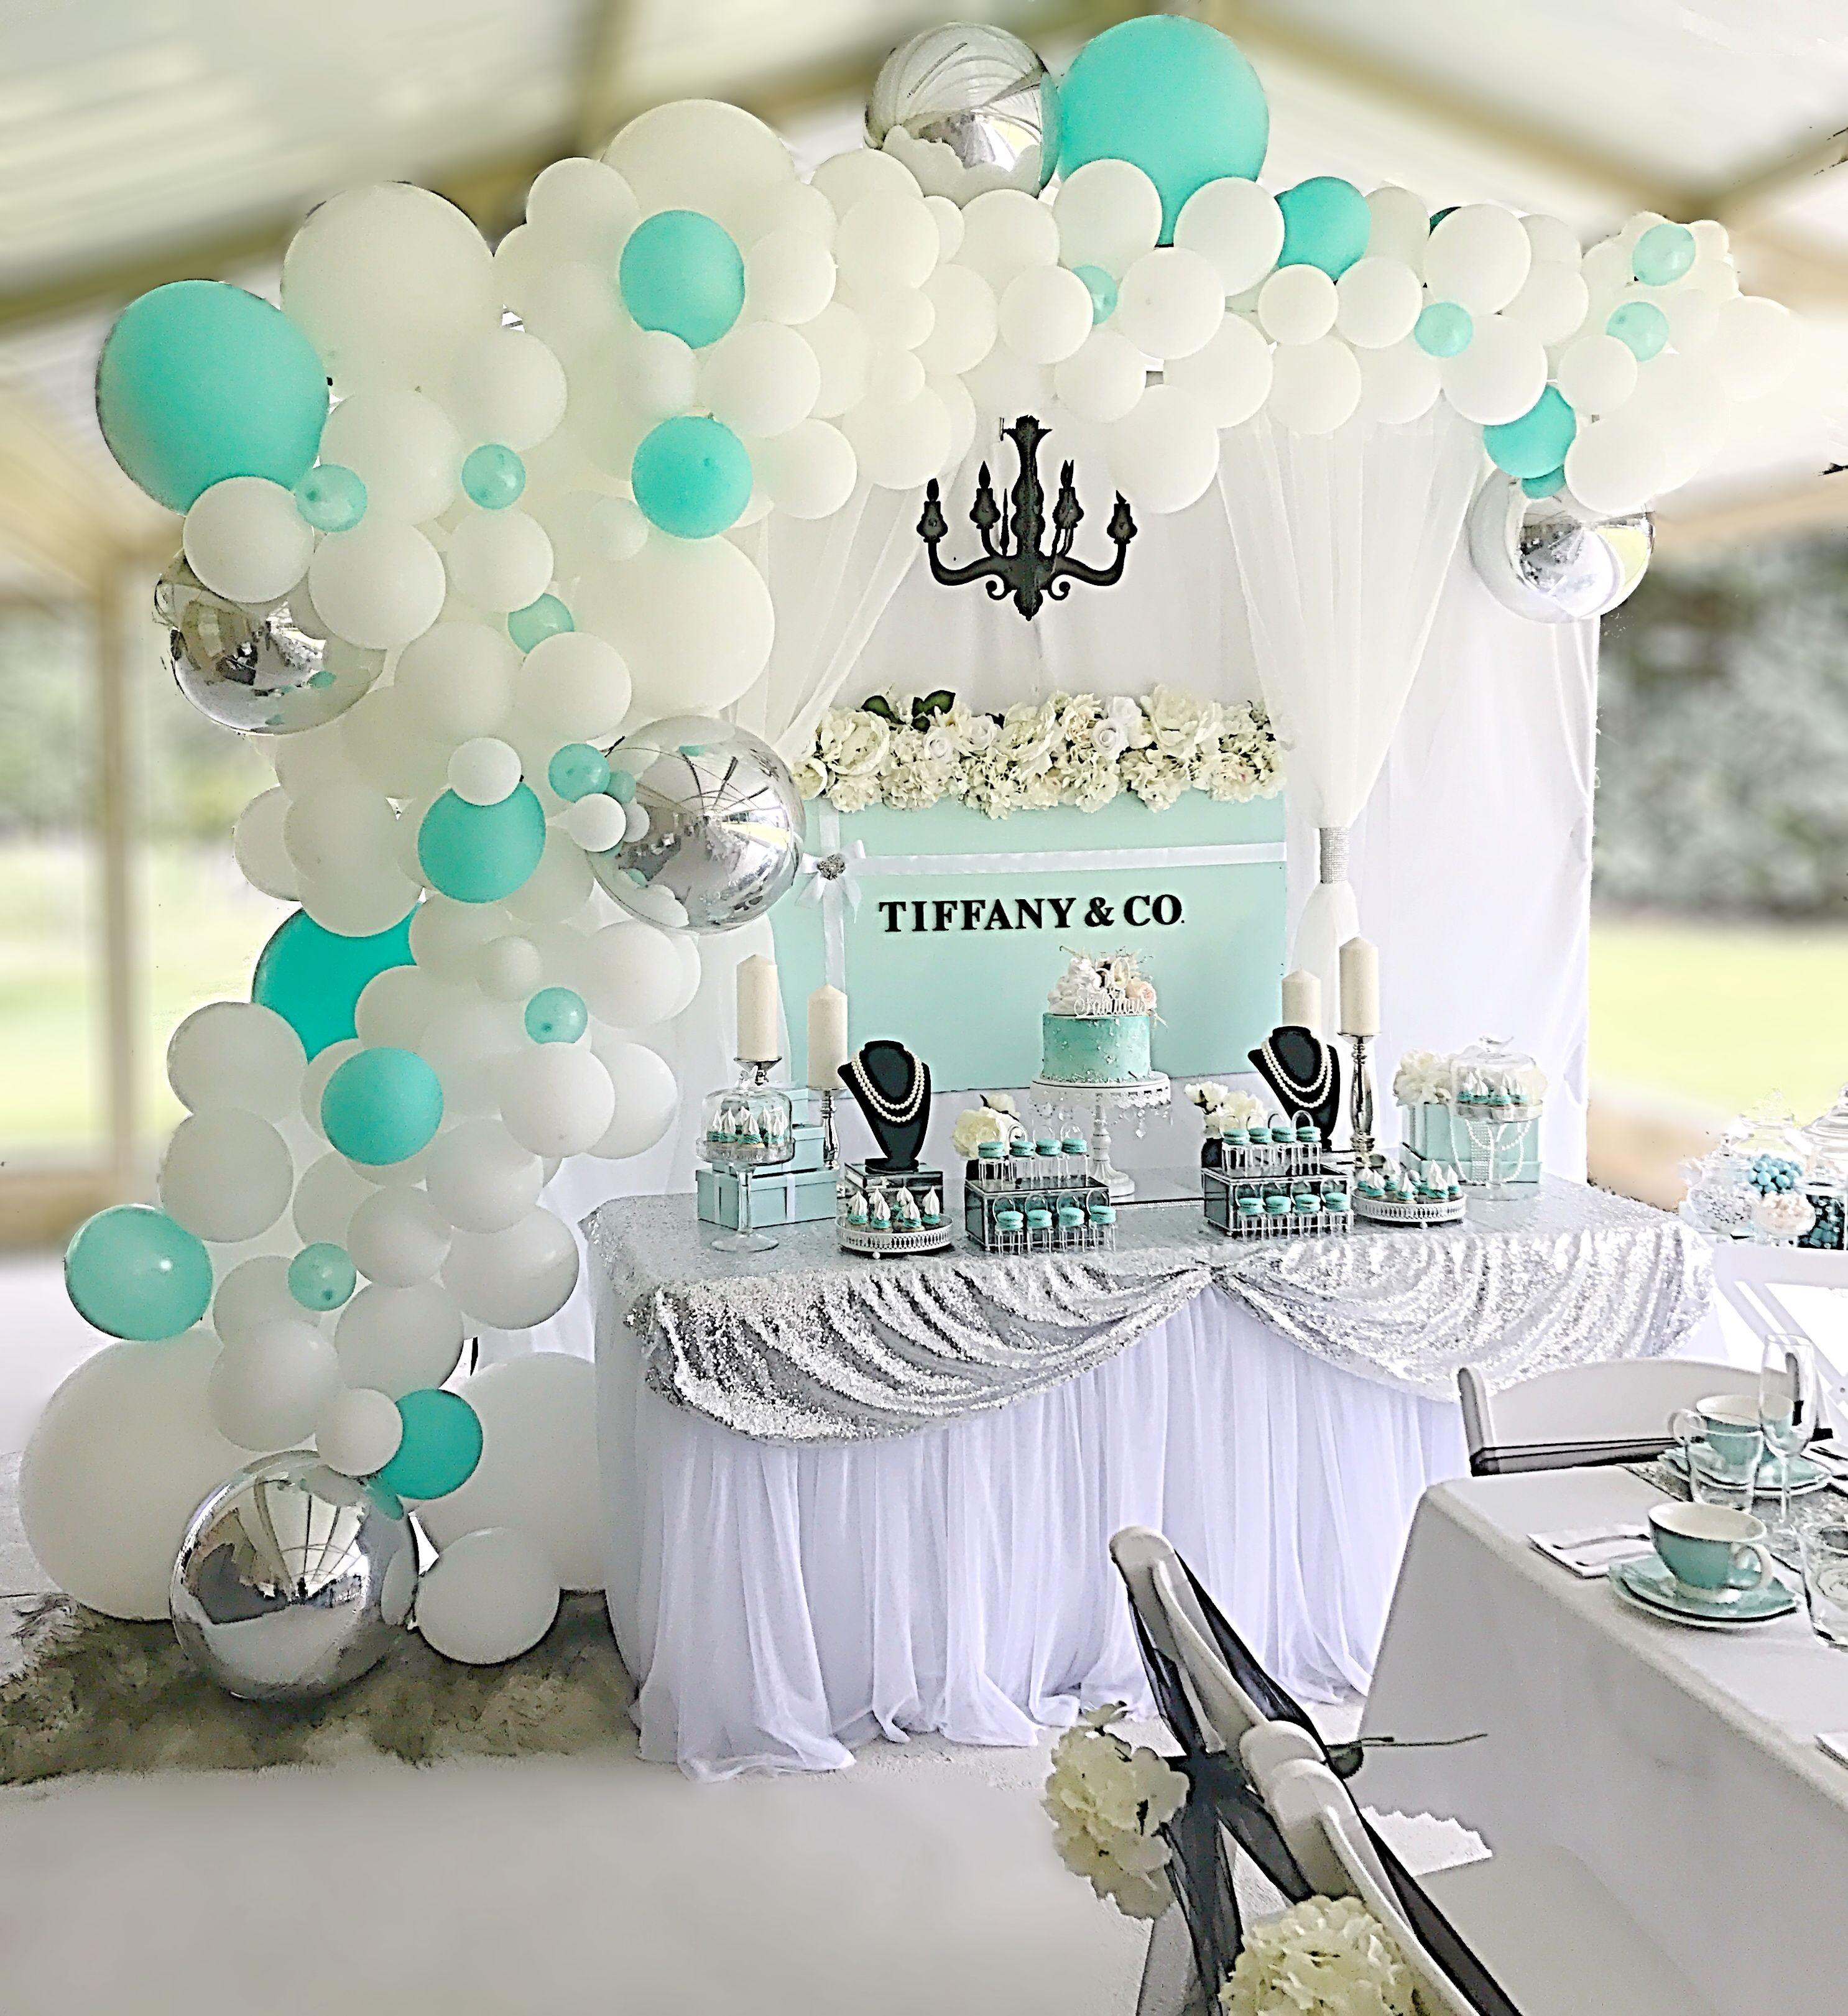 Tiffany u0026 Co backdrop and balloon garlandwhite